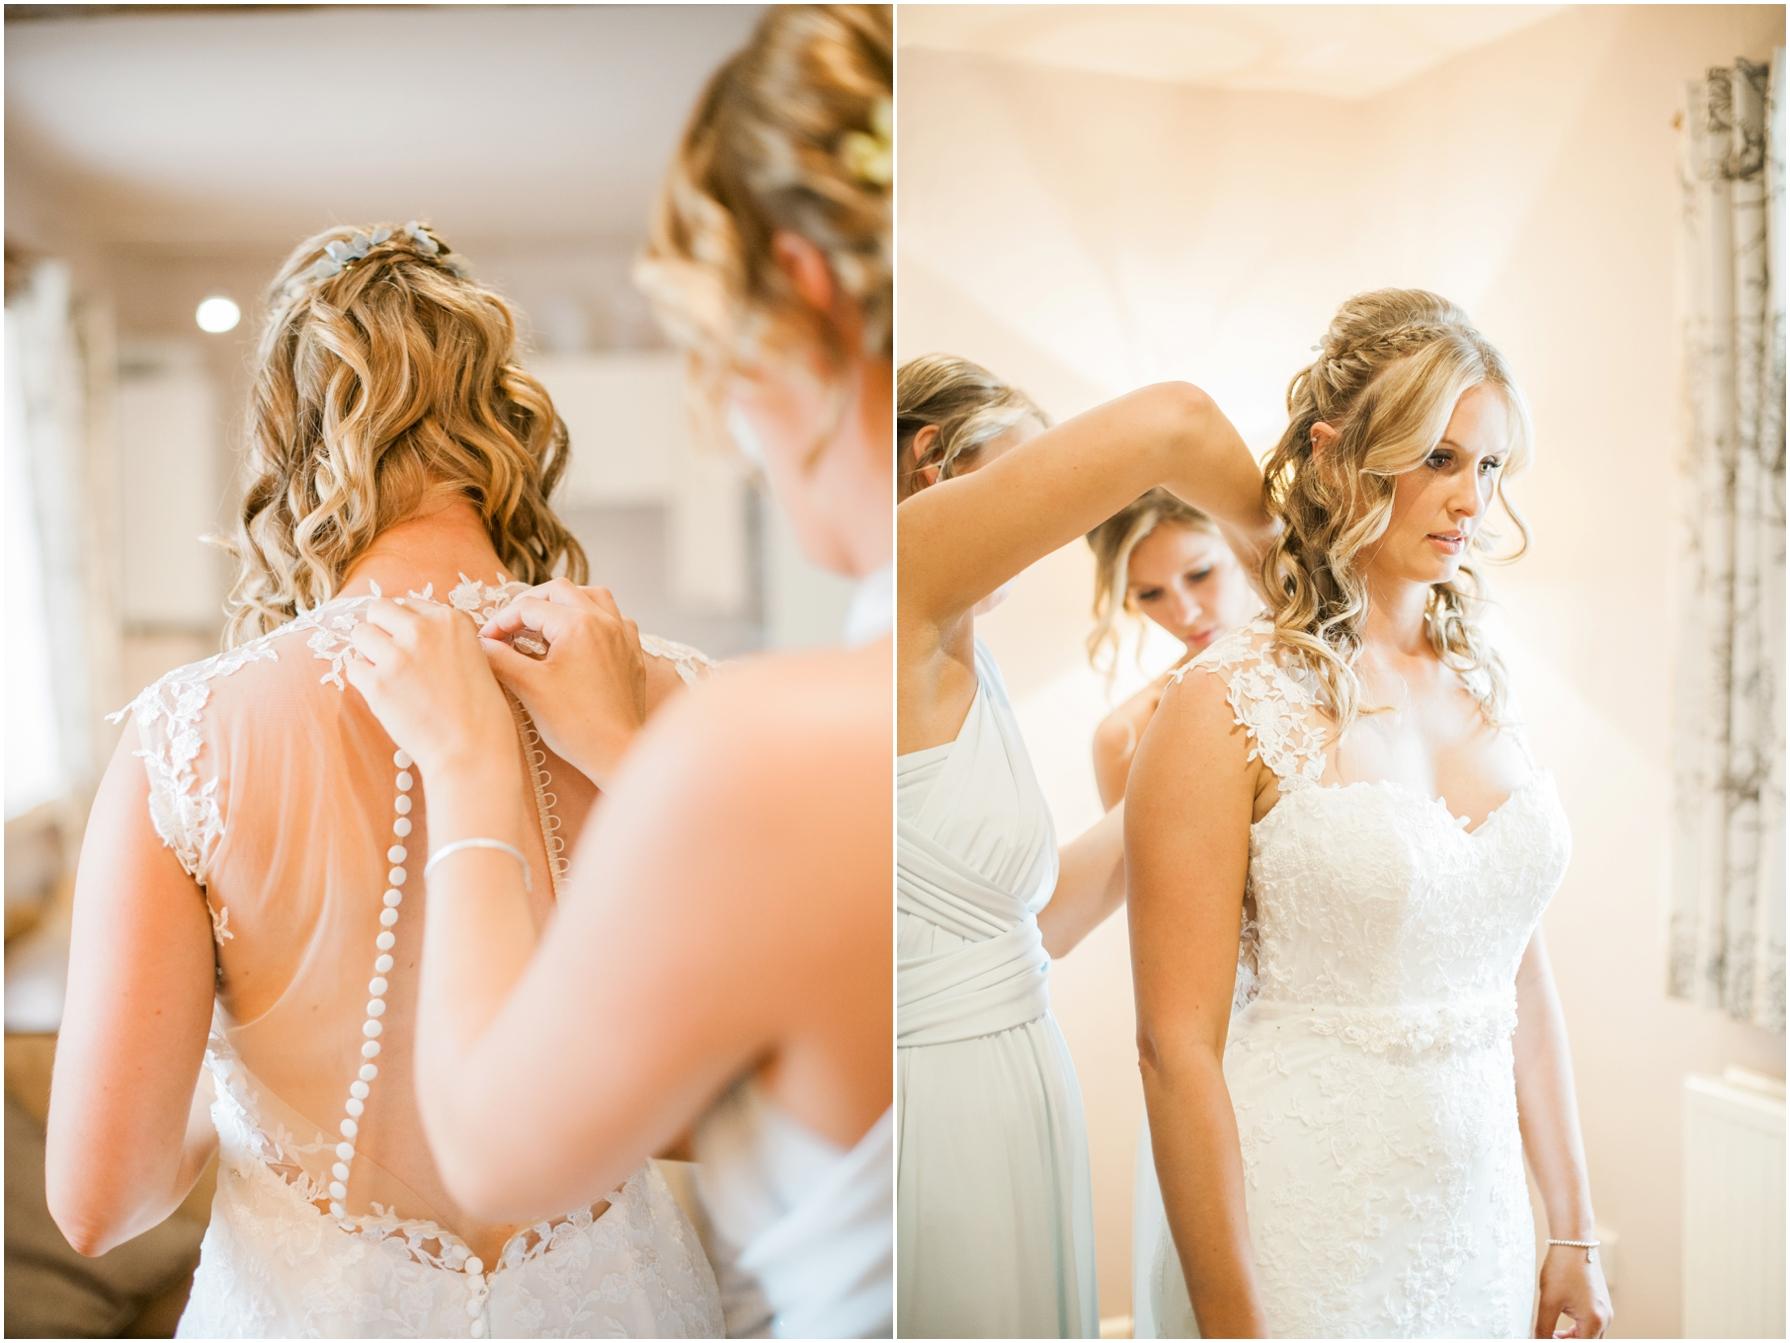 bridesmaid helping bride into her dress